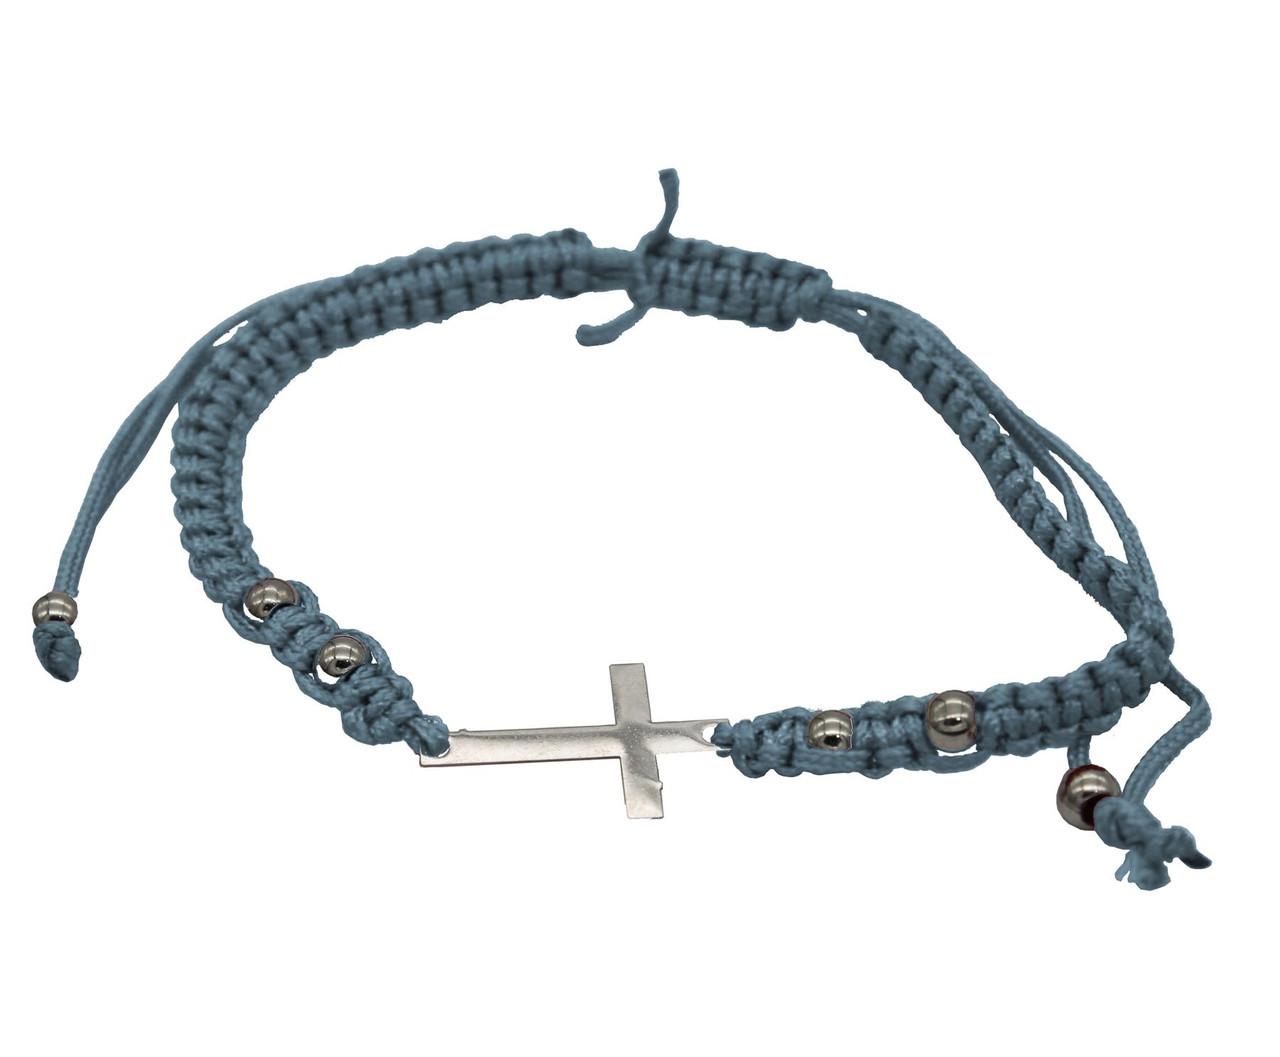 BlUE STRING cross PENDANT Bracelet Messianic Crucifix HOLY LACKY Charm